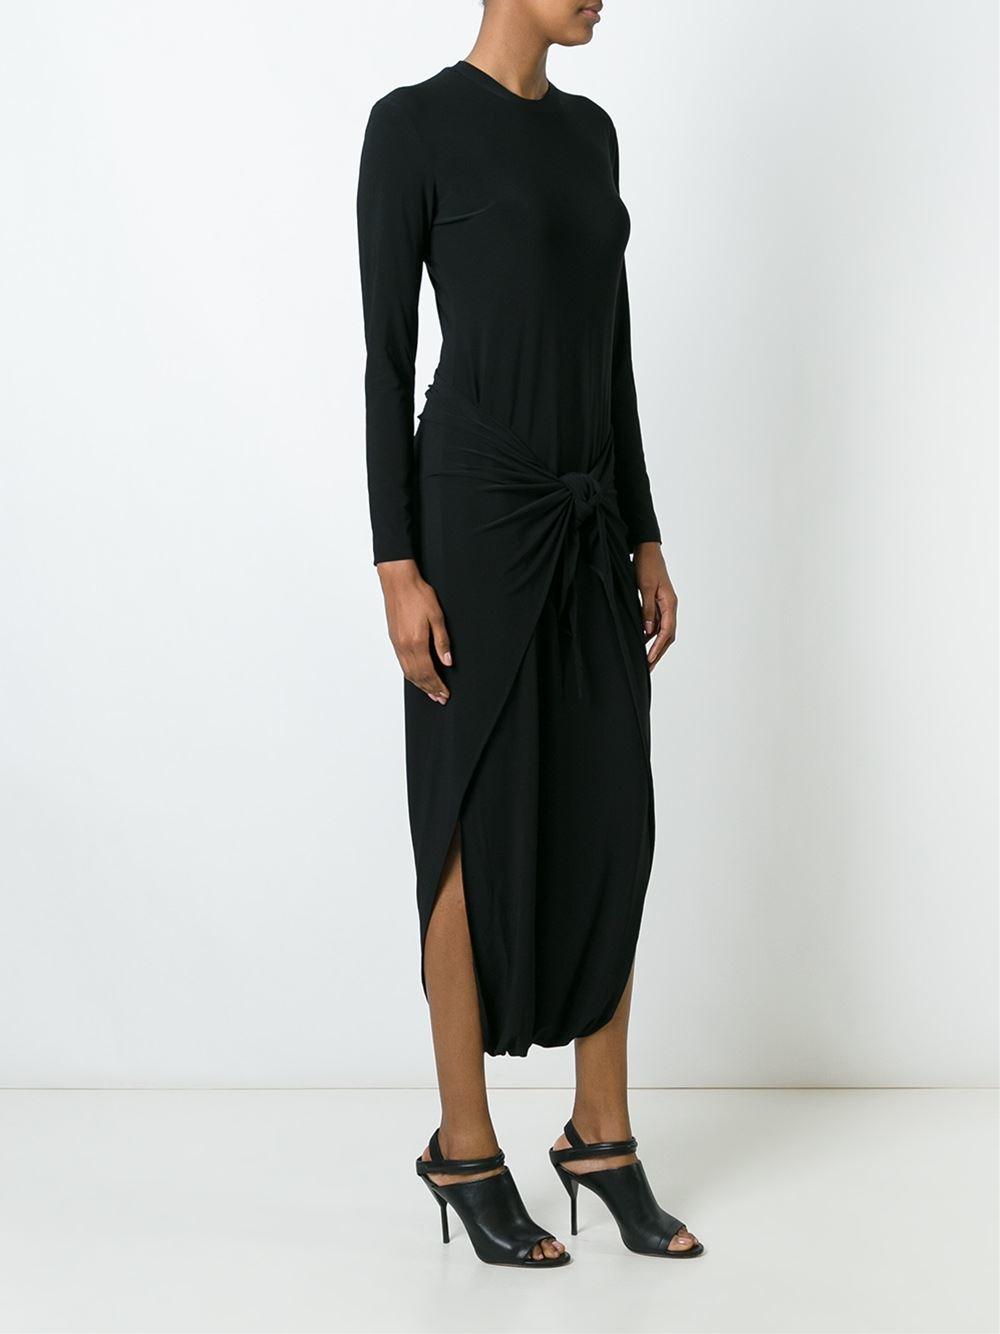 Norma kamali sleeveless dress lyst - Norma kamali costumi da bagno ...